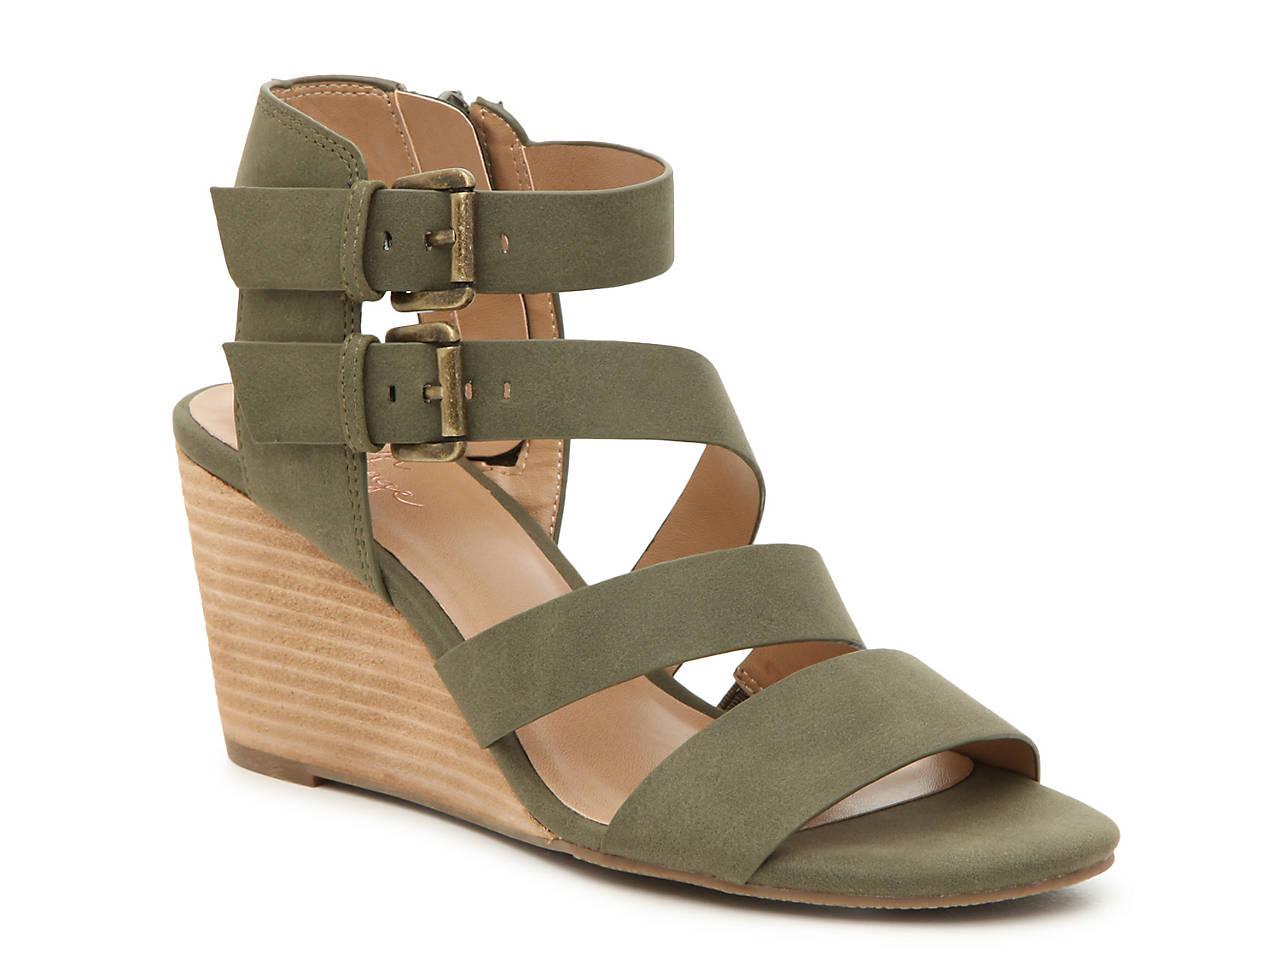 646d2a3e840 Crown Vintage Carlotta Wedge Sandal Women s Shoes